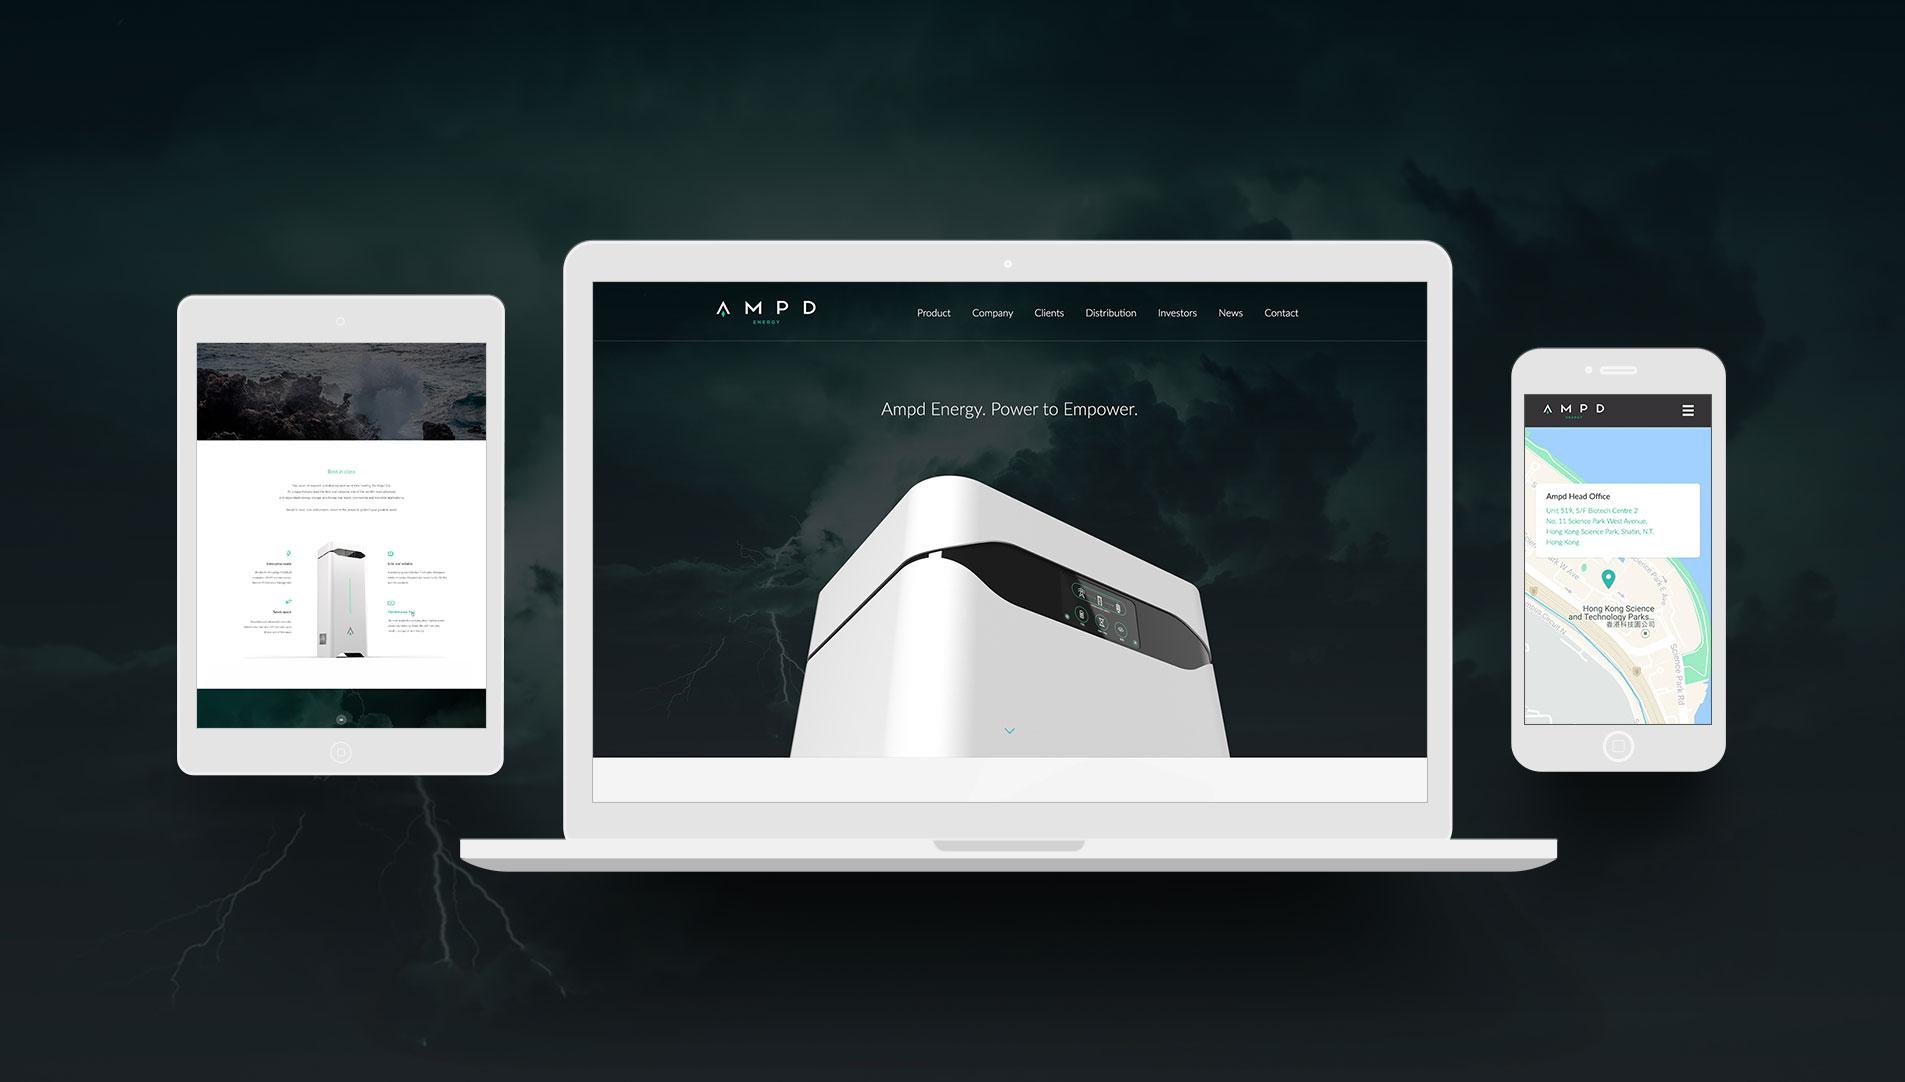 web design ampd slideshow 01